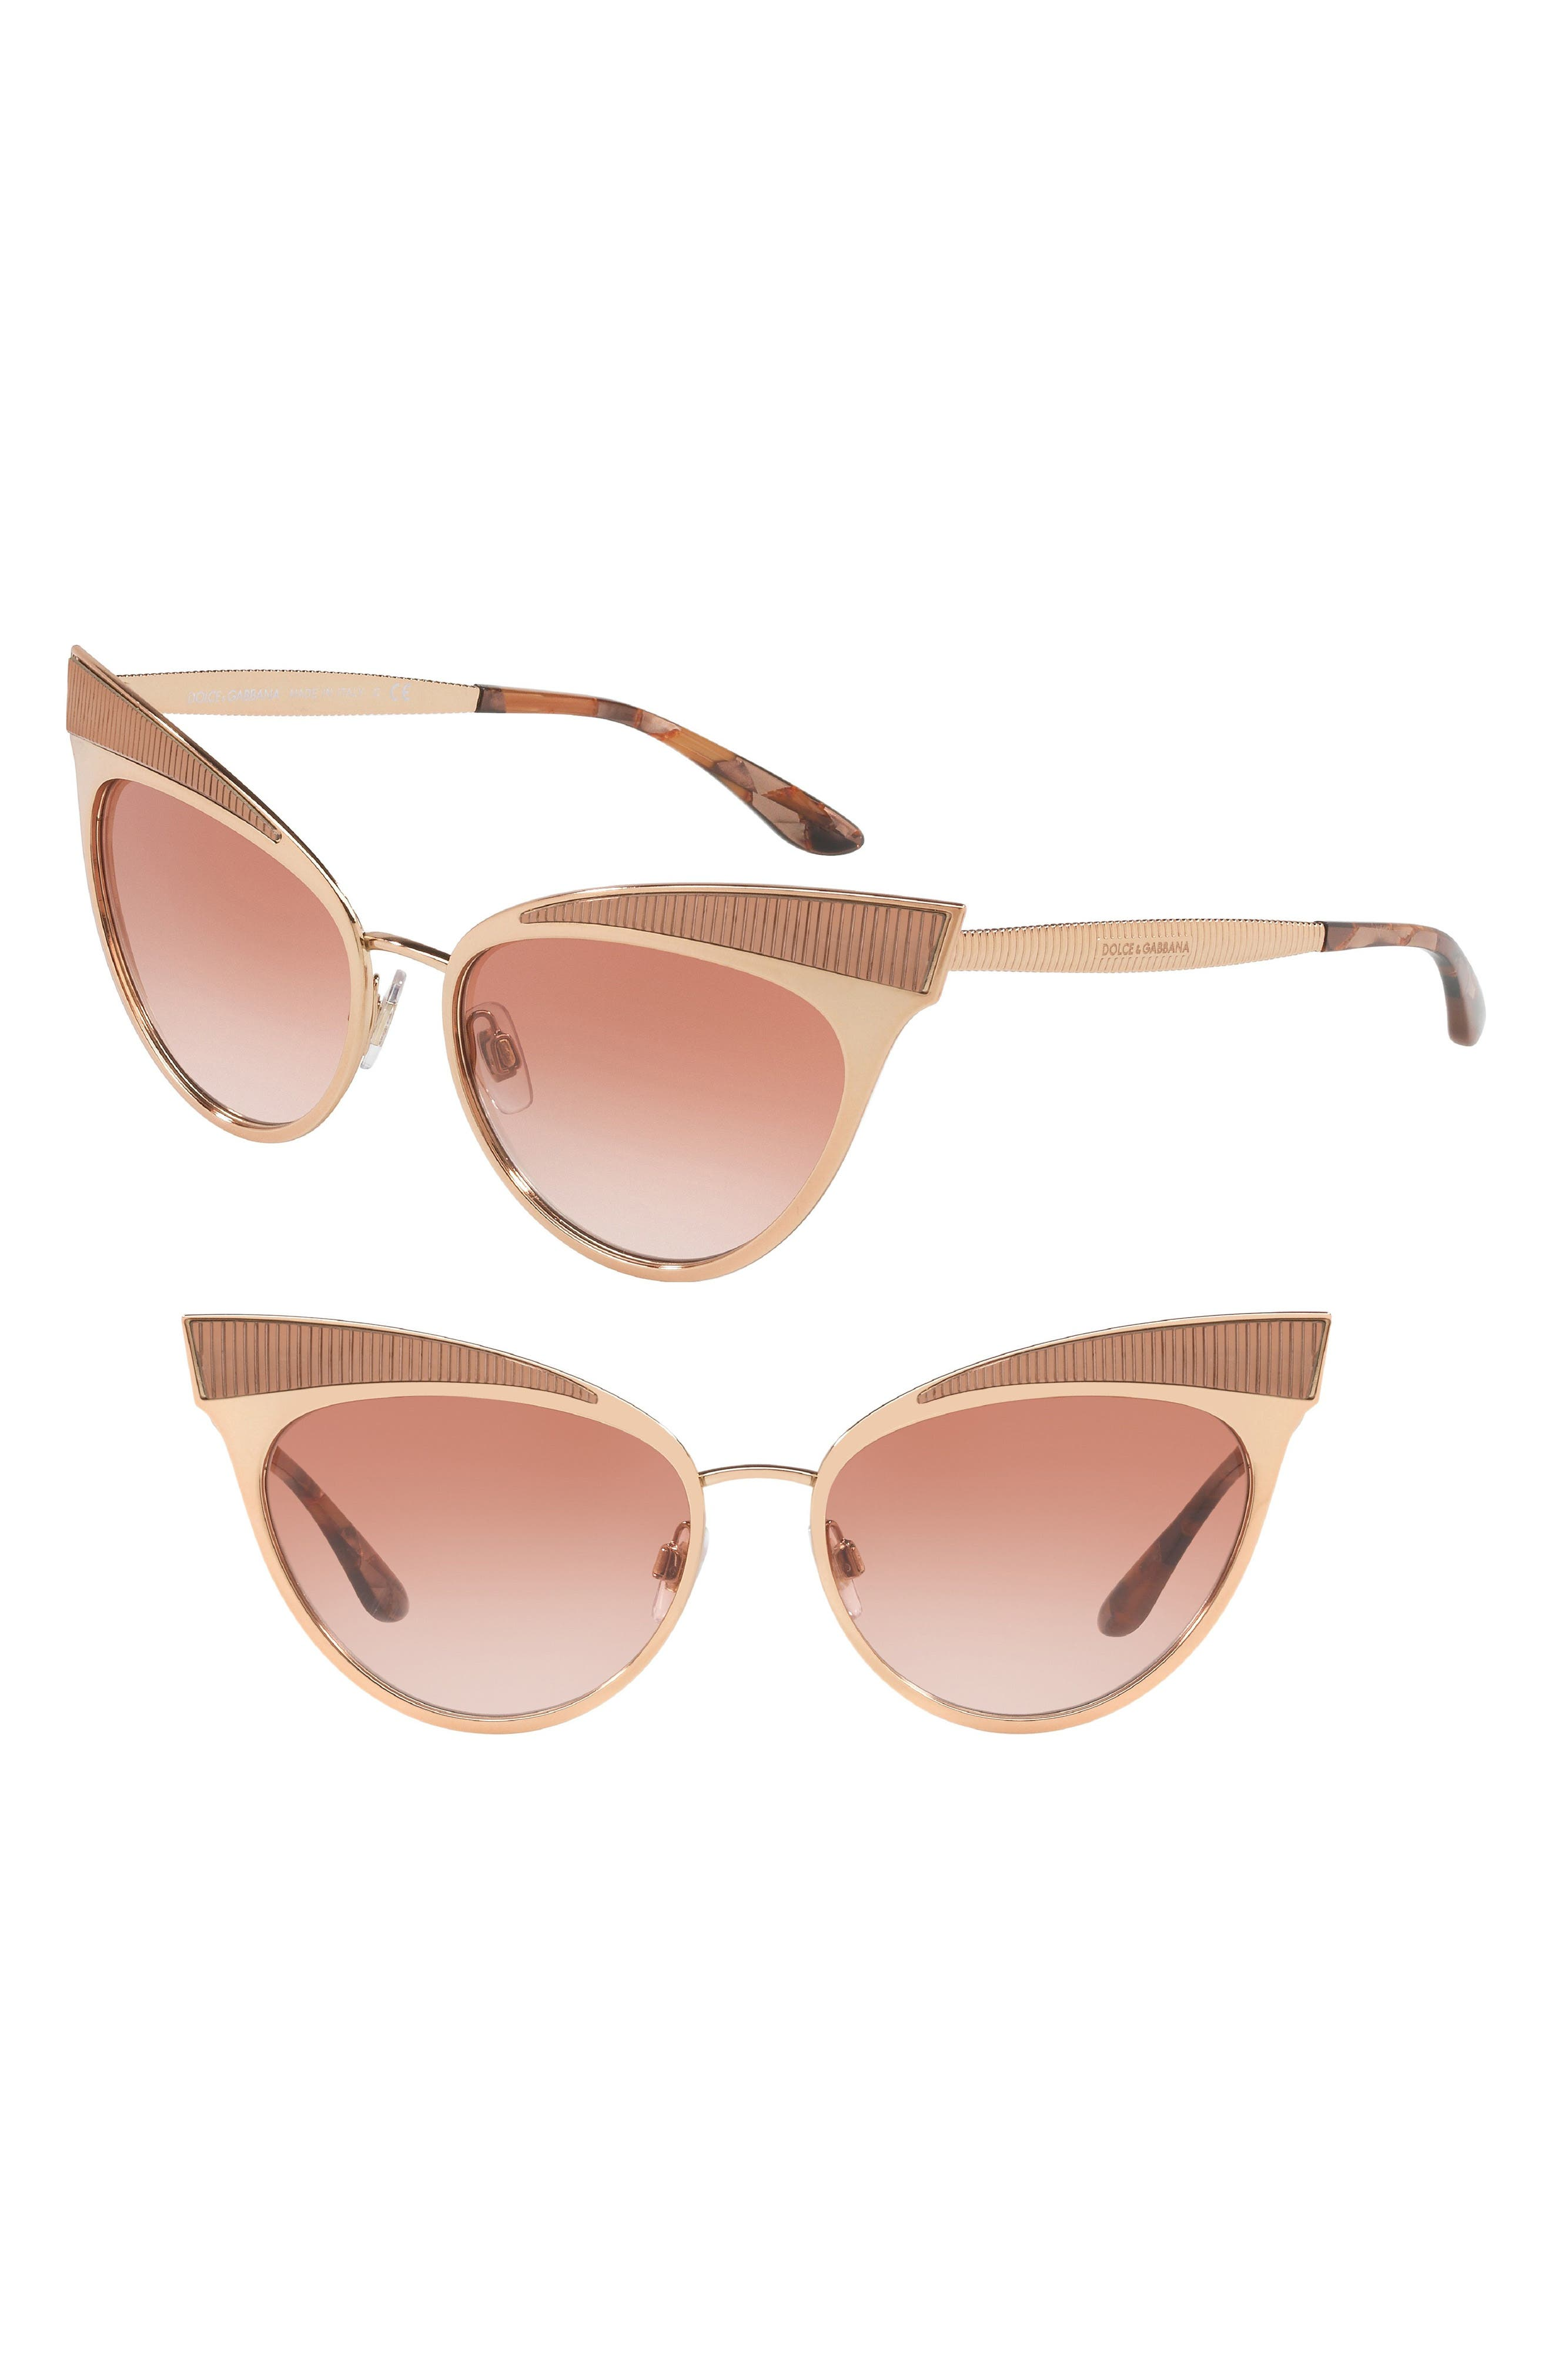 Image of Dolce & Gabbana 57mm Cat Eye Sunglasses